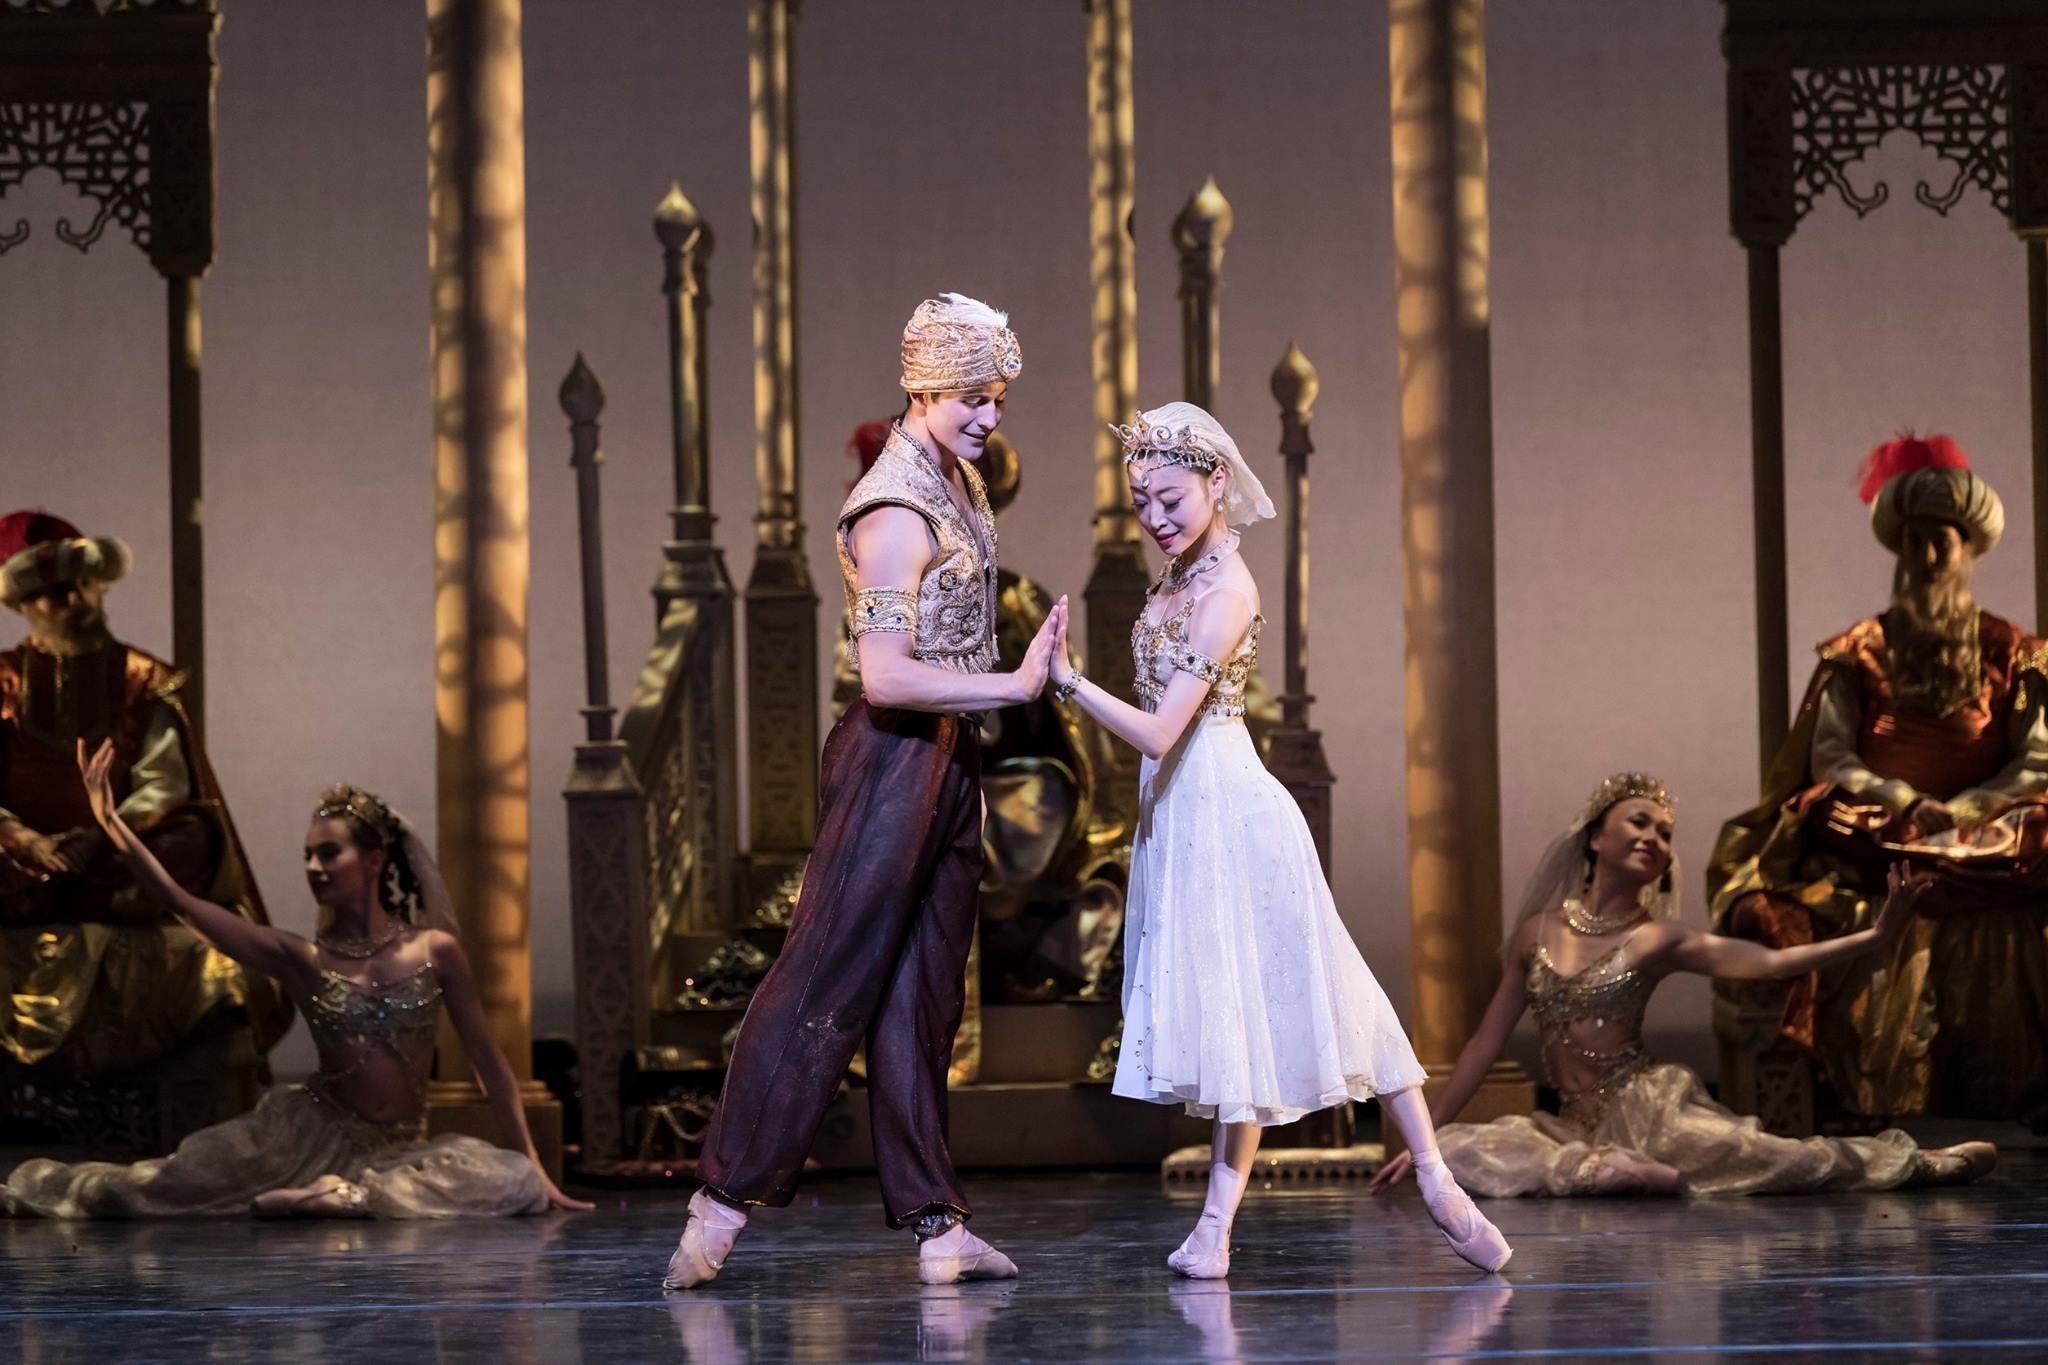 Birmingham royal ballet in ualaddinu photos by bill cooper